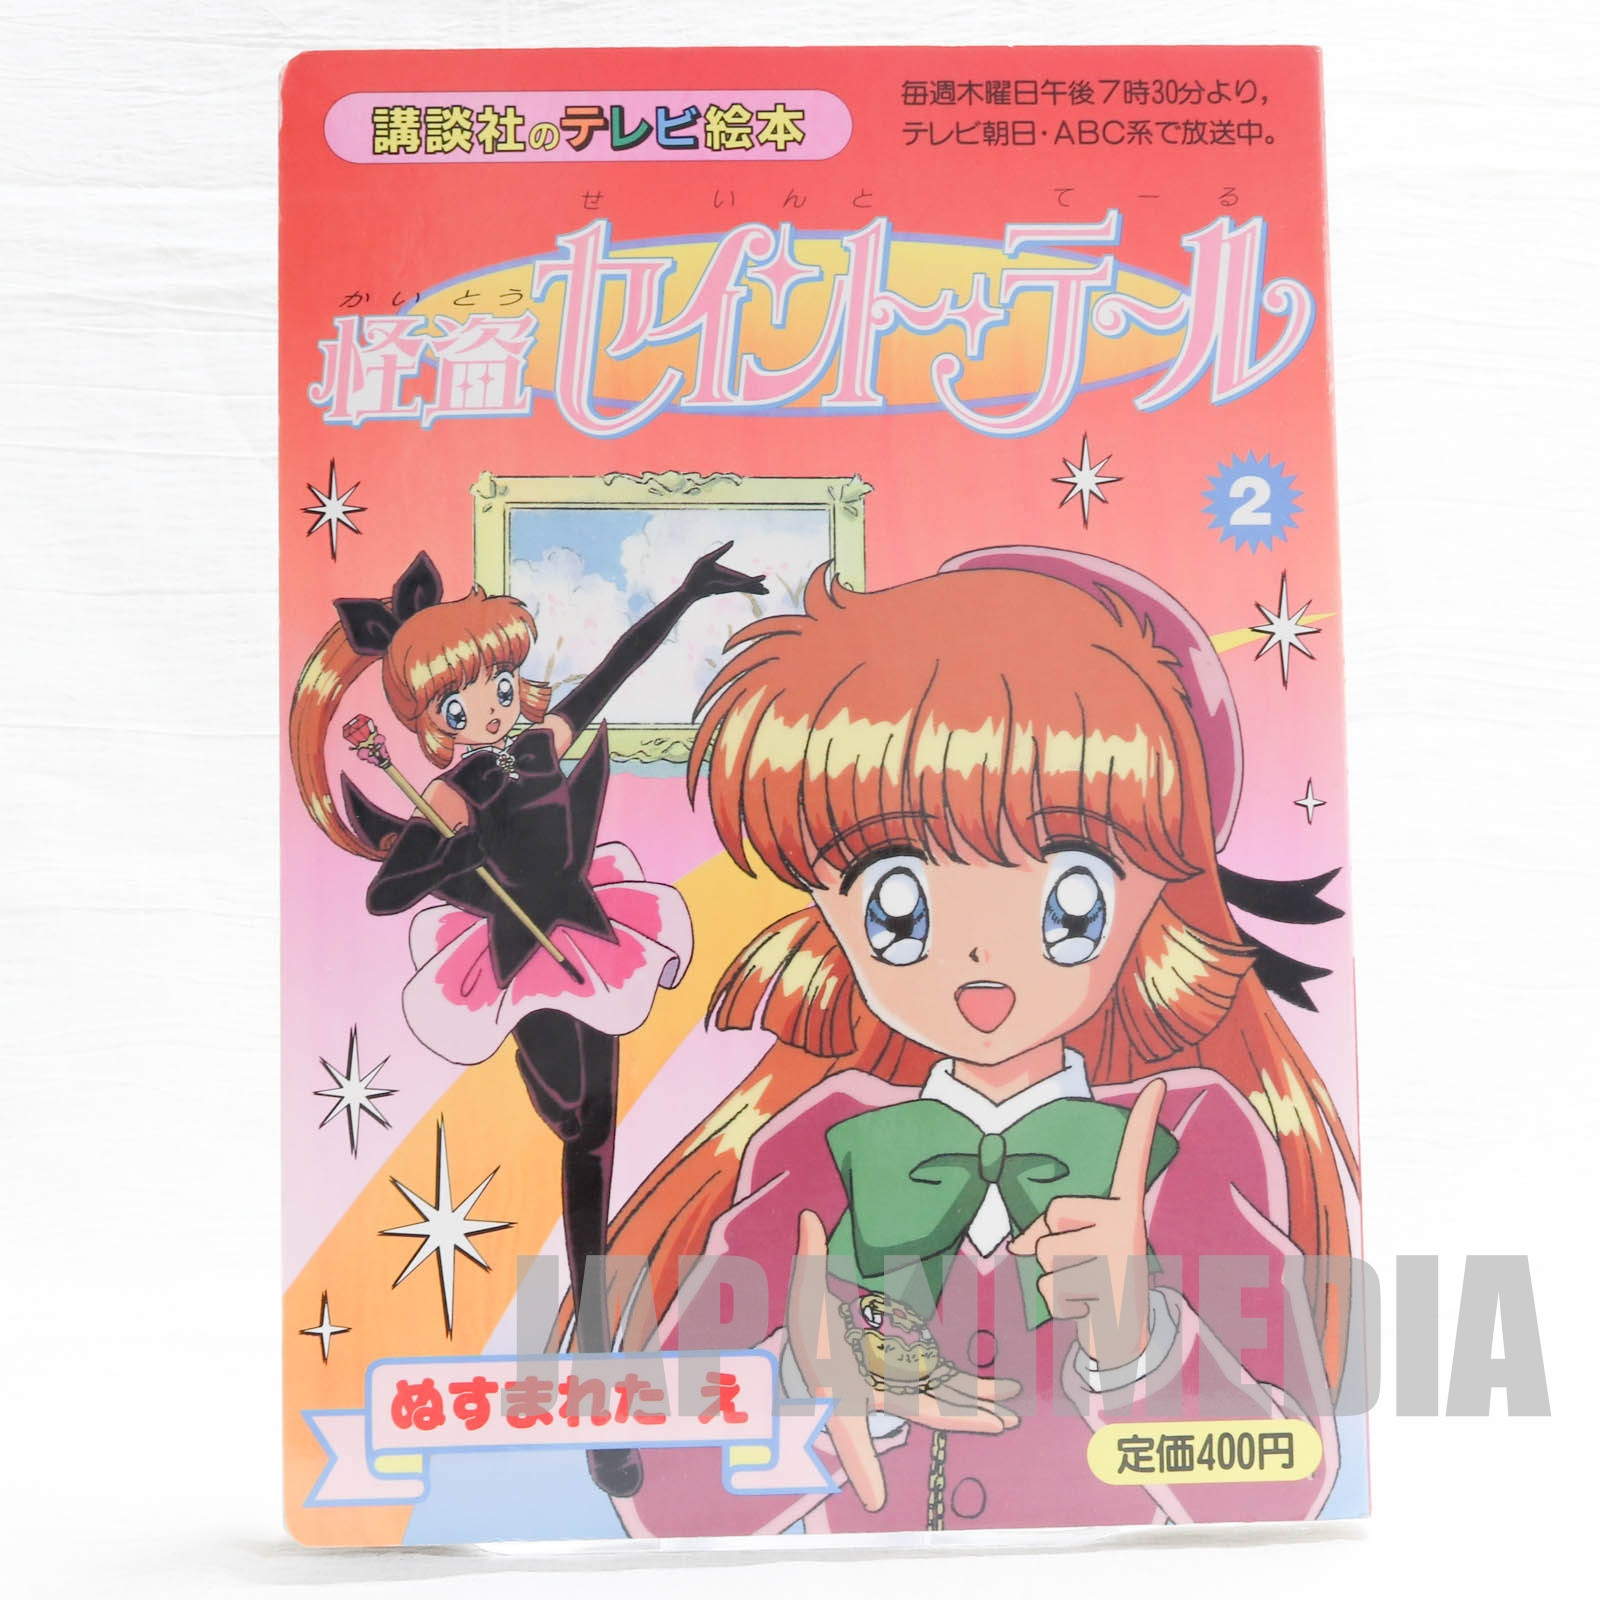 Saint Tail TV Picture book [2] Stolen paintings JAPAN ANIME